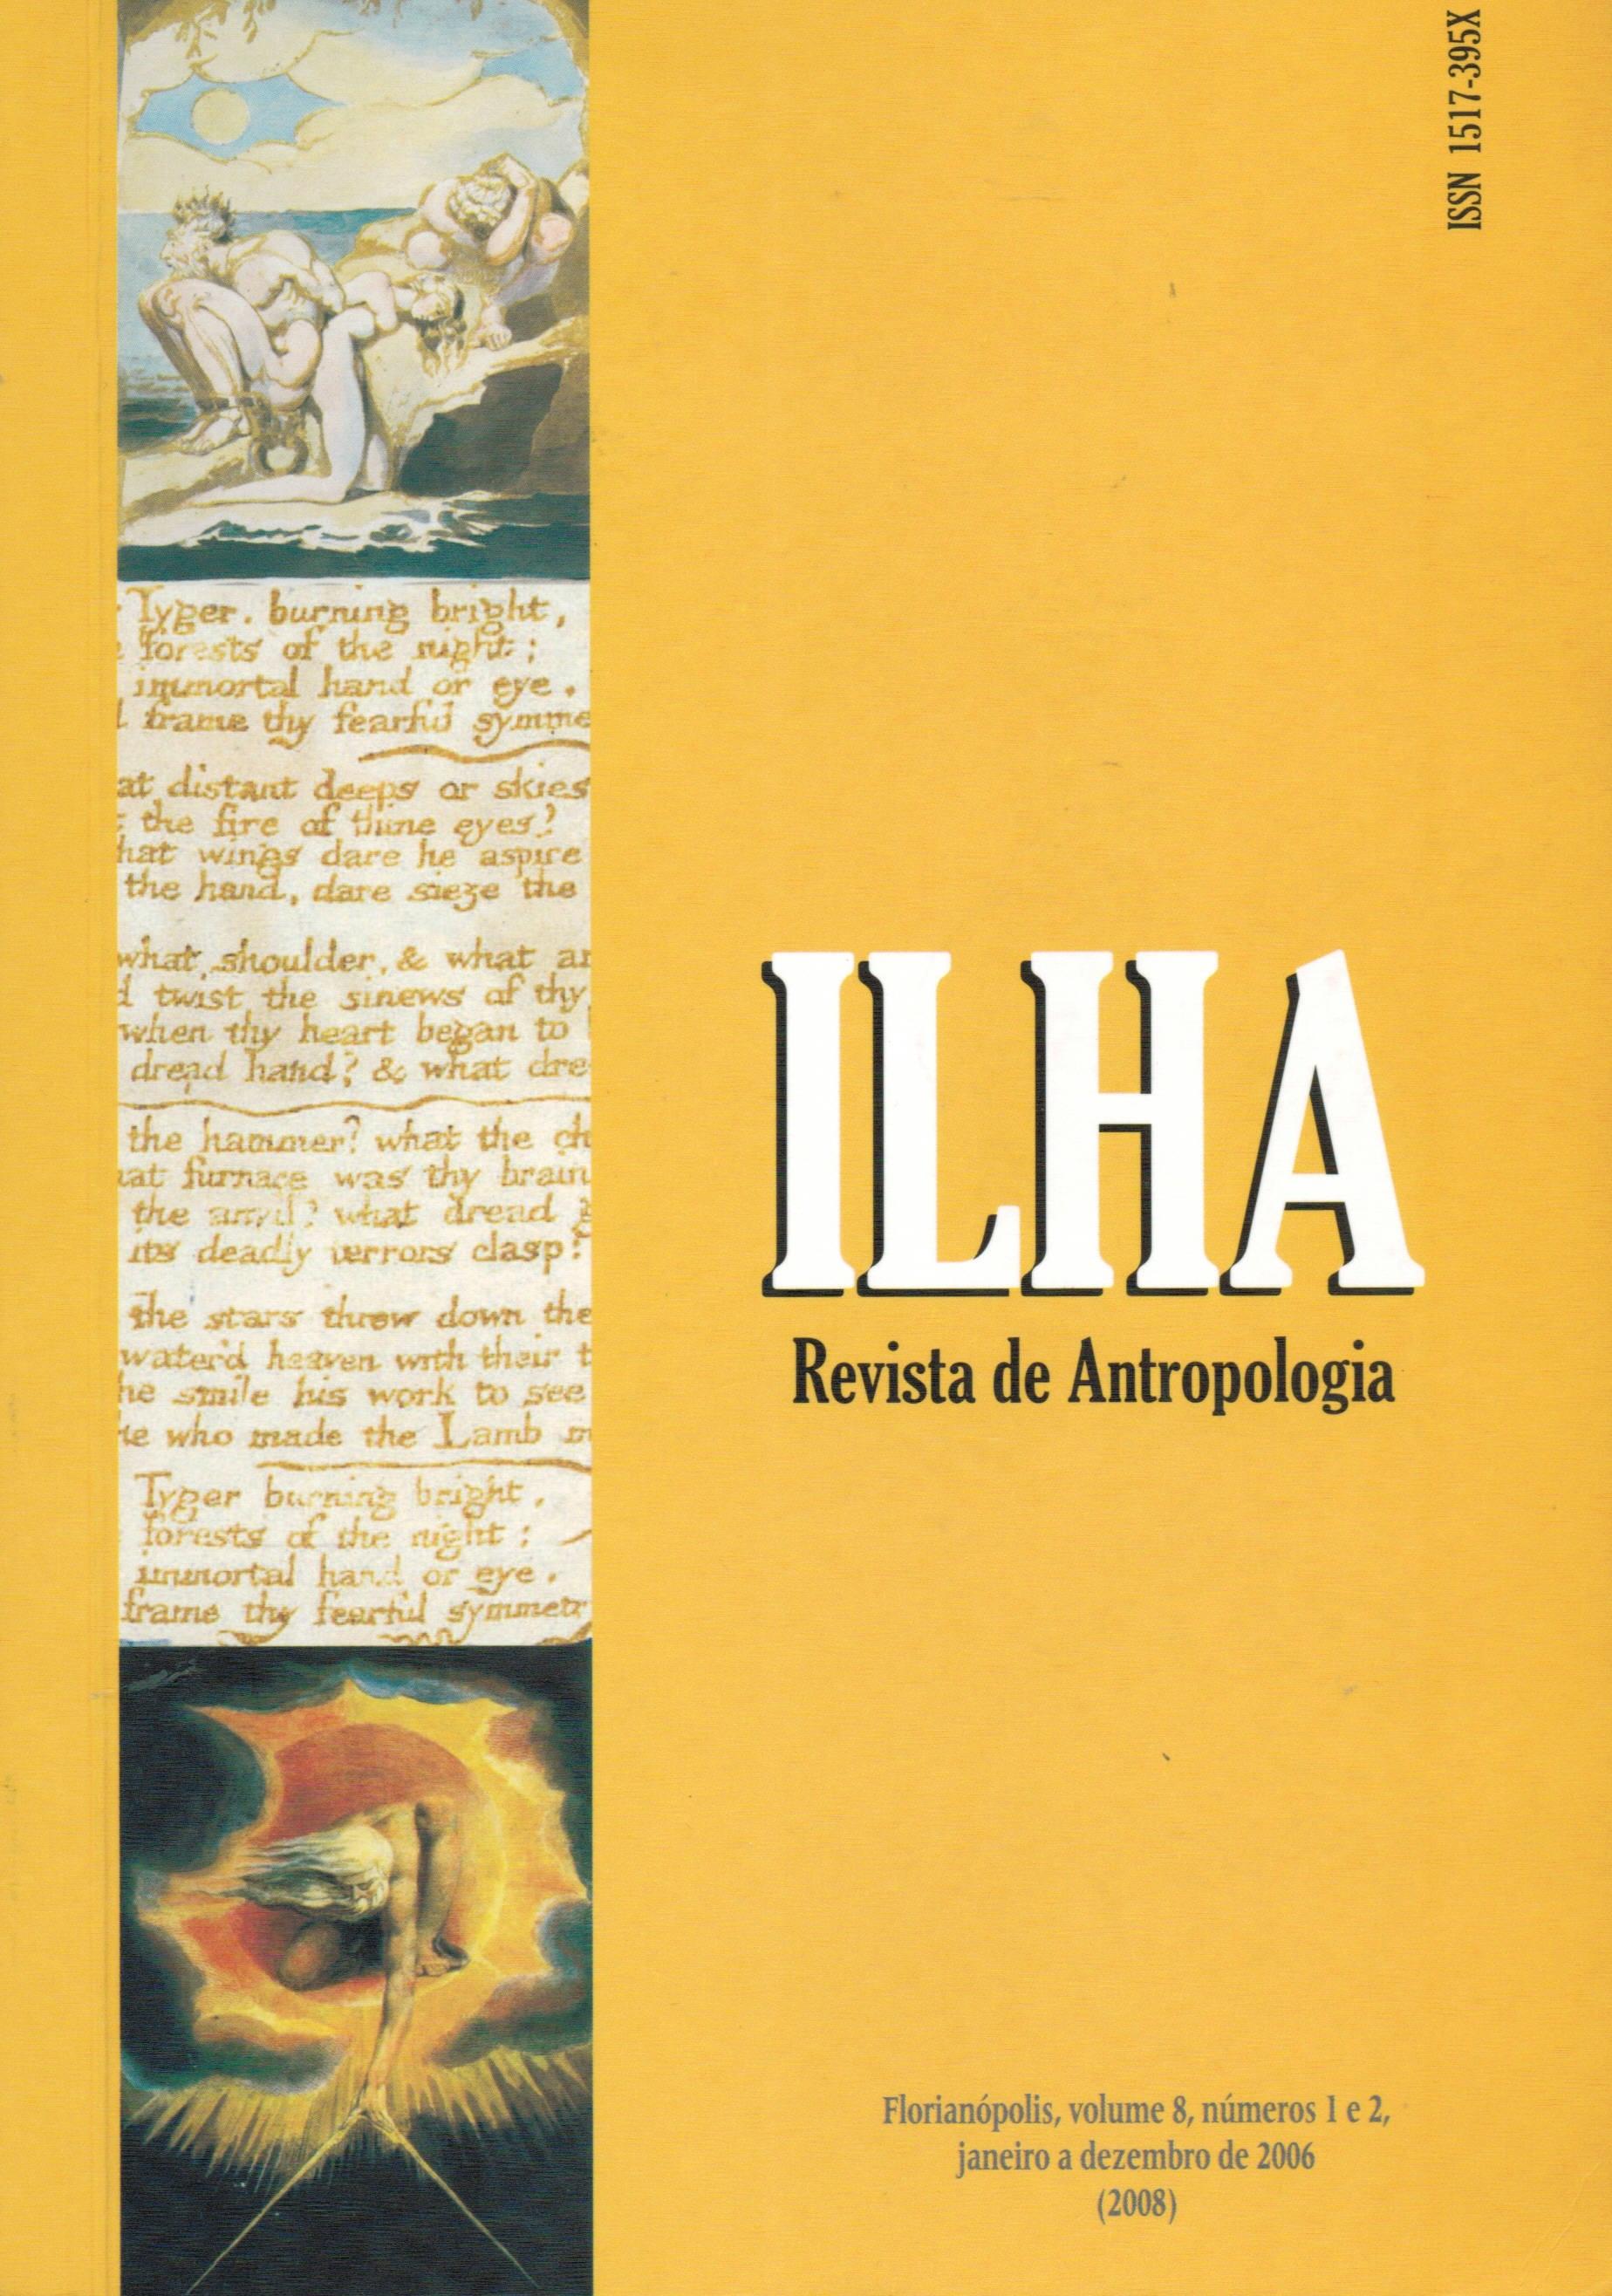 Editora deste volume: Professora Doutora Alicia Norma González Castells